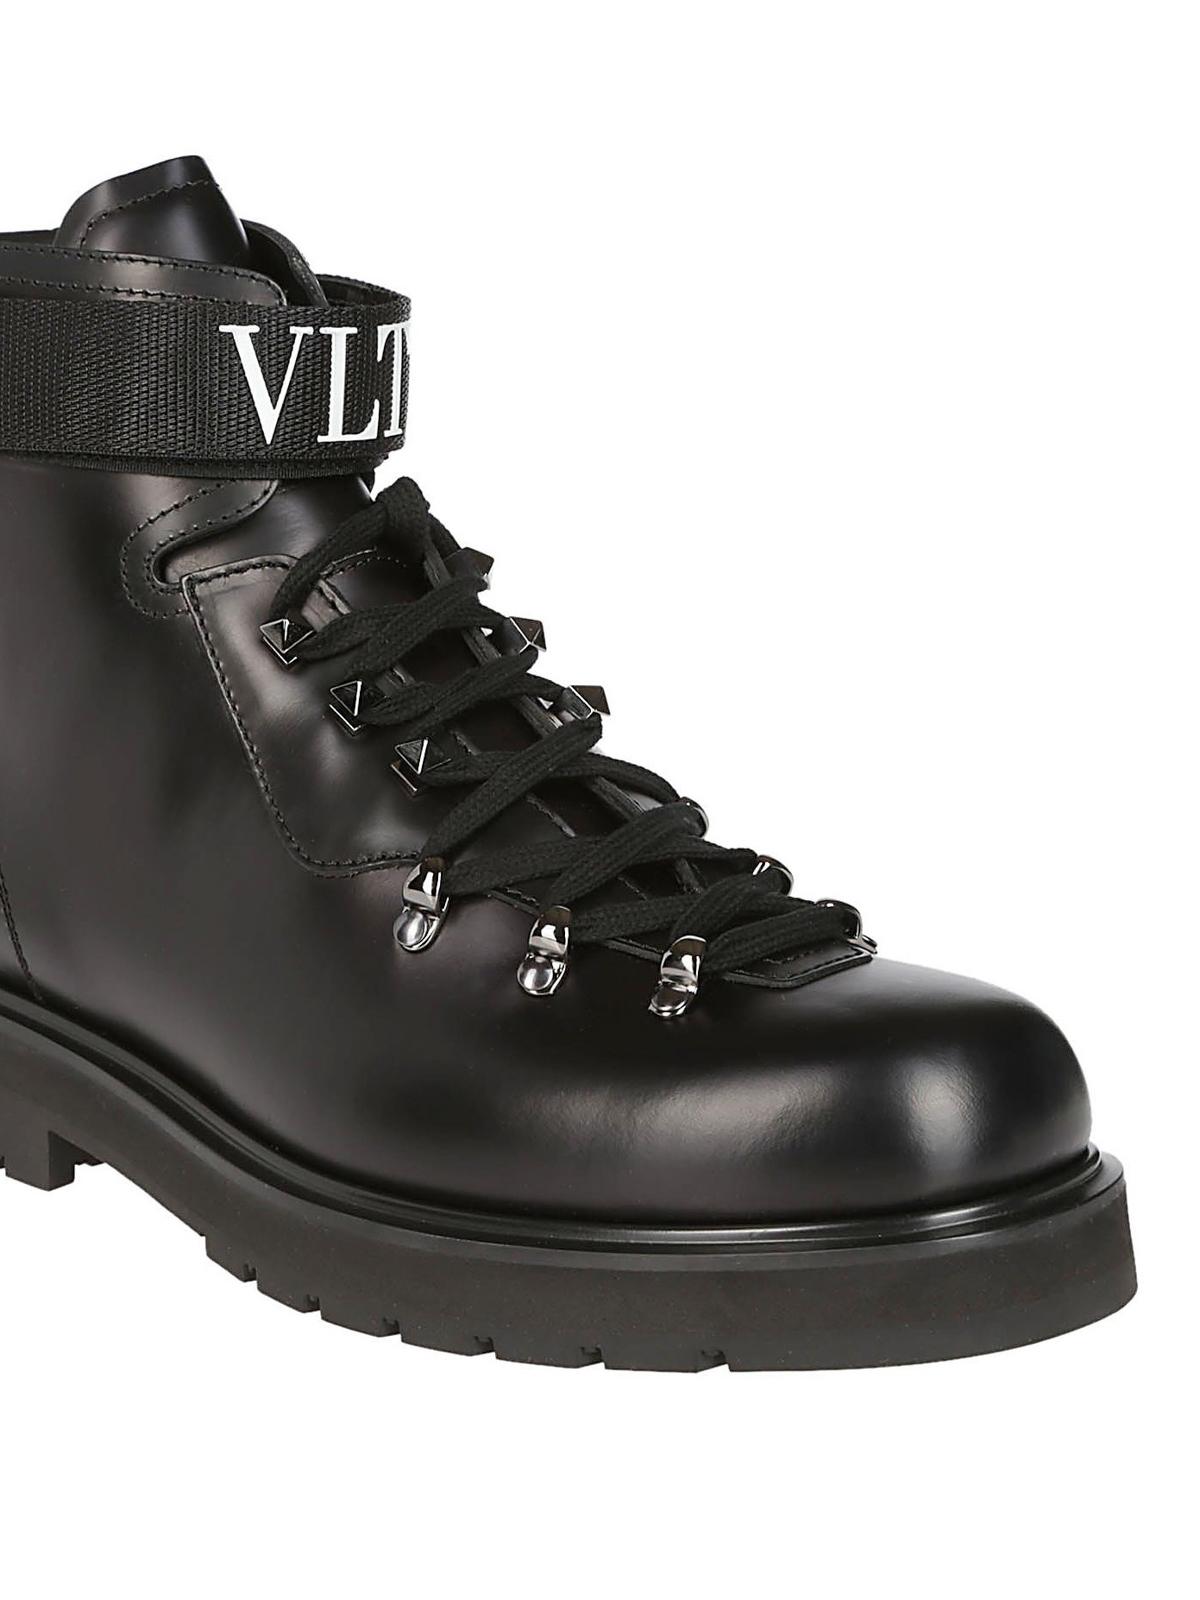 34afd2f22df Valentino Garavani - VLTN leather ankle boots - ankle boots ...